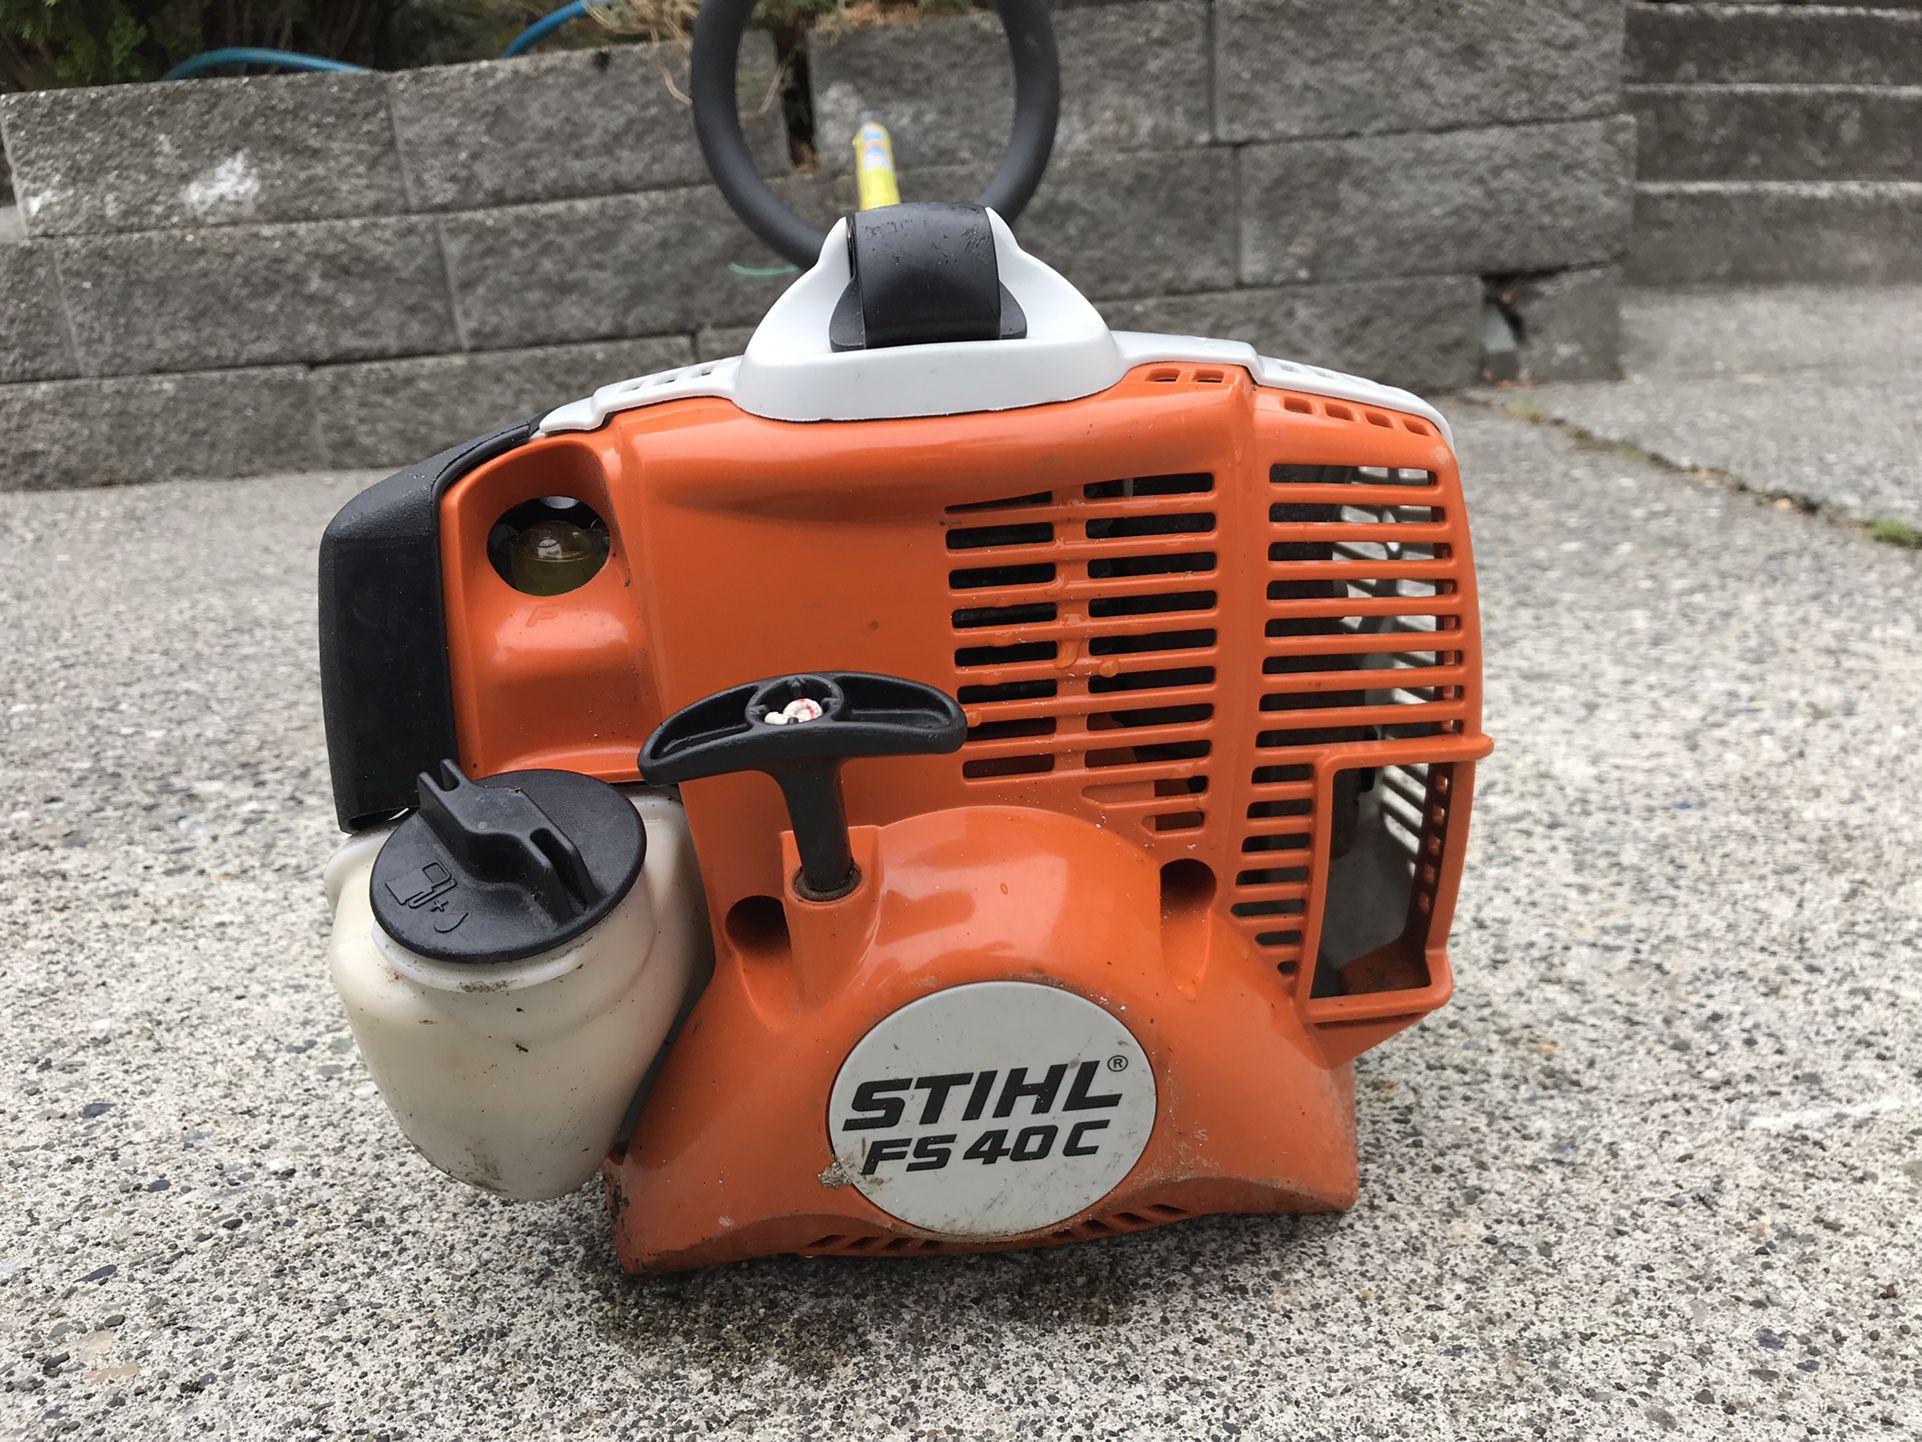 STIHL FS40 trimmer